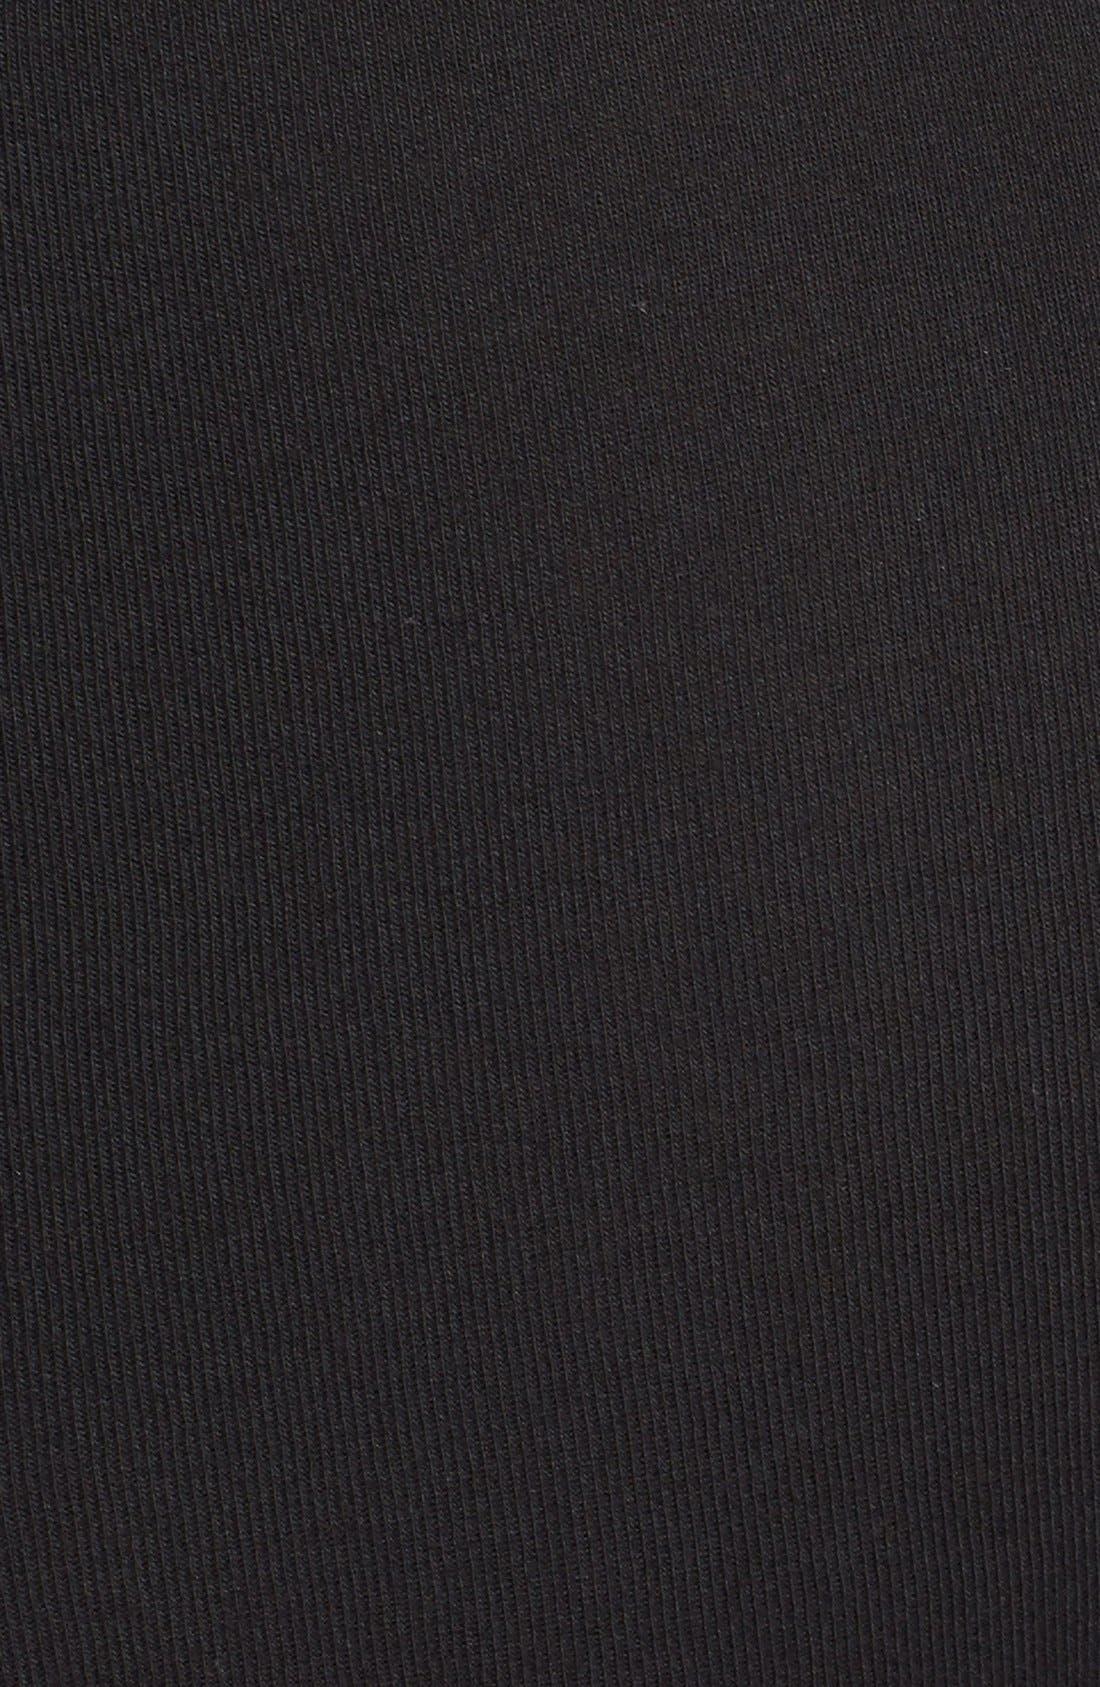 Alternate Image 3  - Polo Ralph Lauren 4-Pack Low Rise Briefs